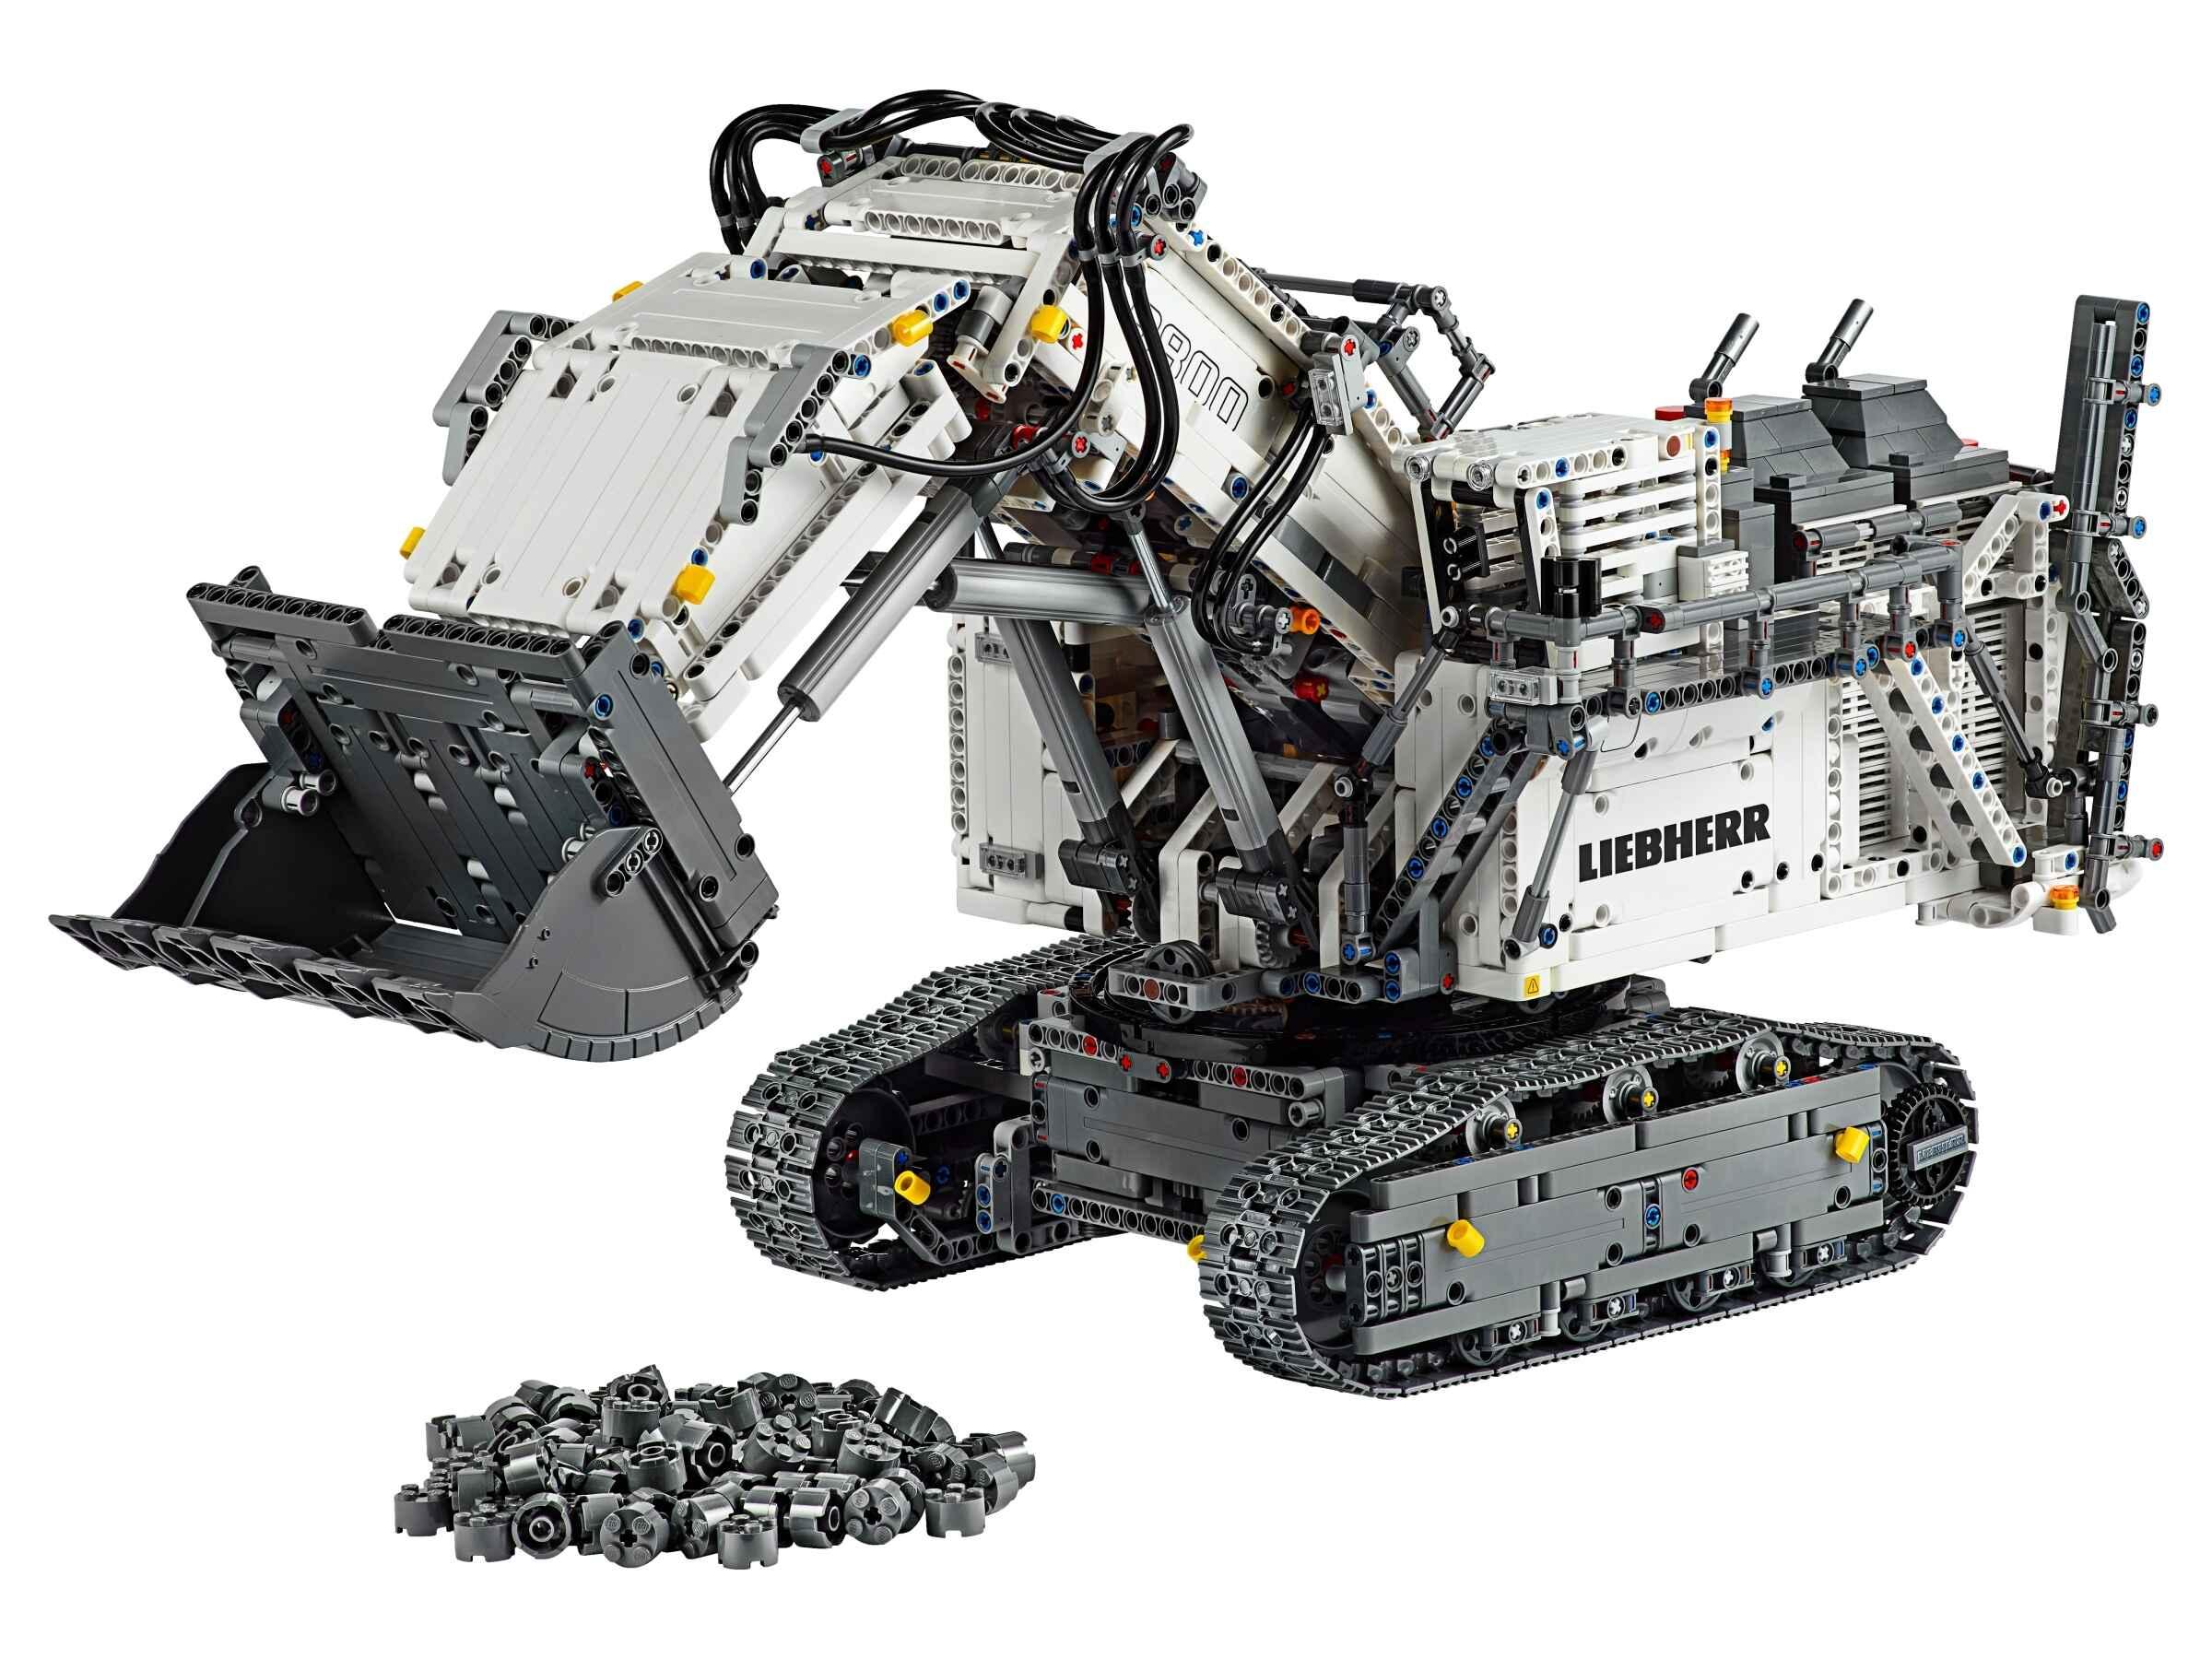 LEGO 42100 Technic Liebherr Bagger R 9800, App-gesteuerte Konstruktionsspielzeug